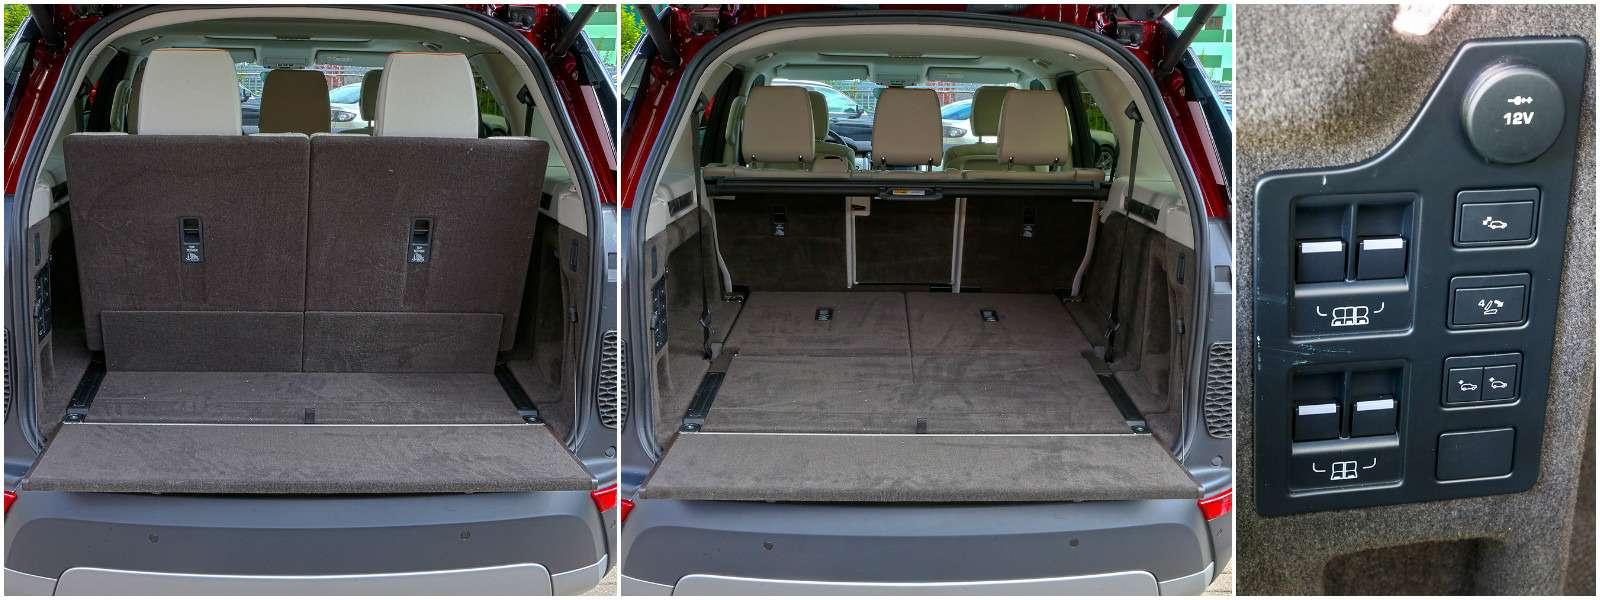 Новый Land Rover Discovery против конкурентов— тест ЗР— фото 784728